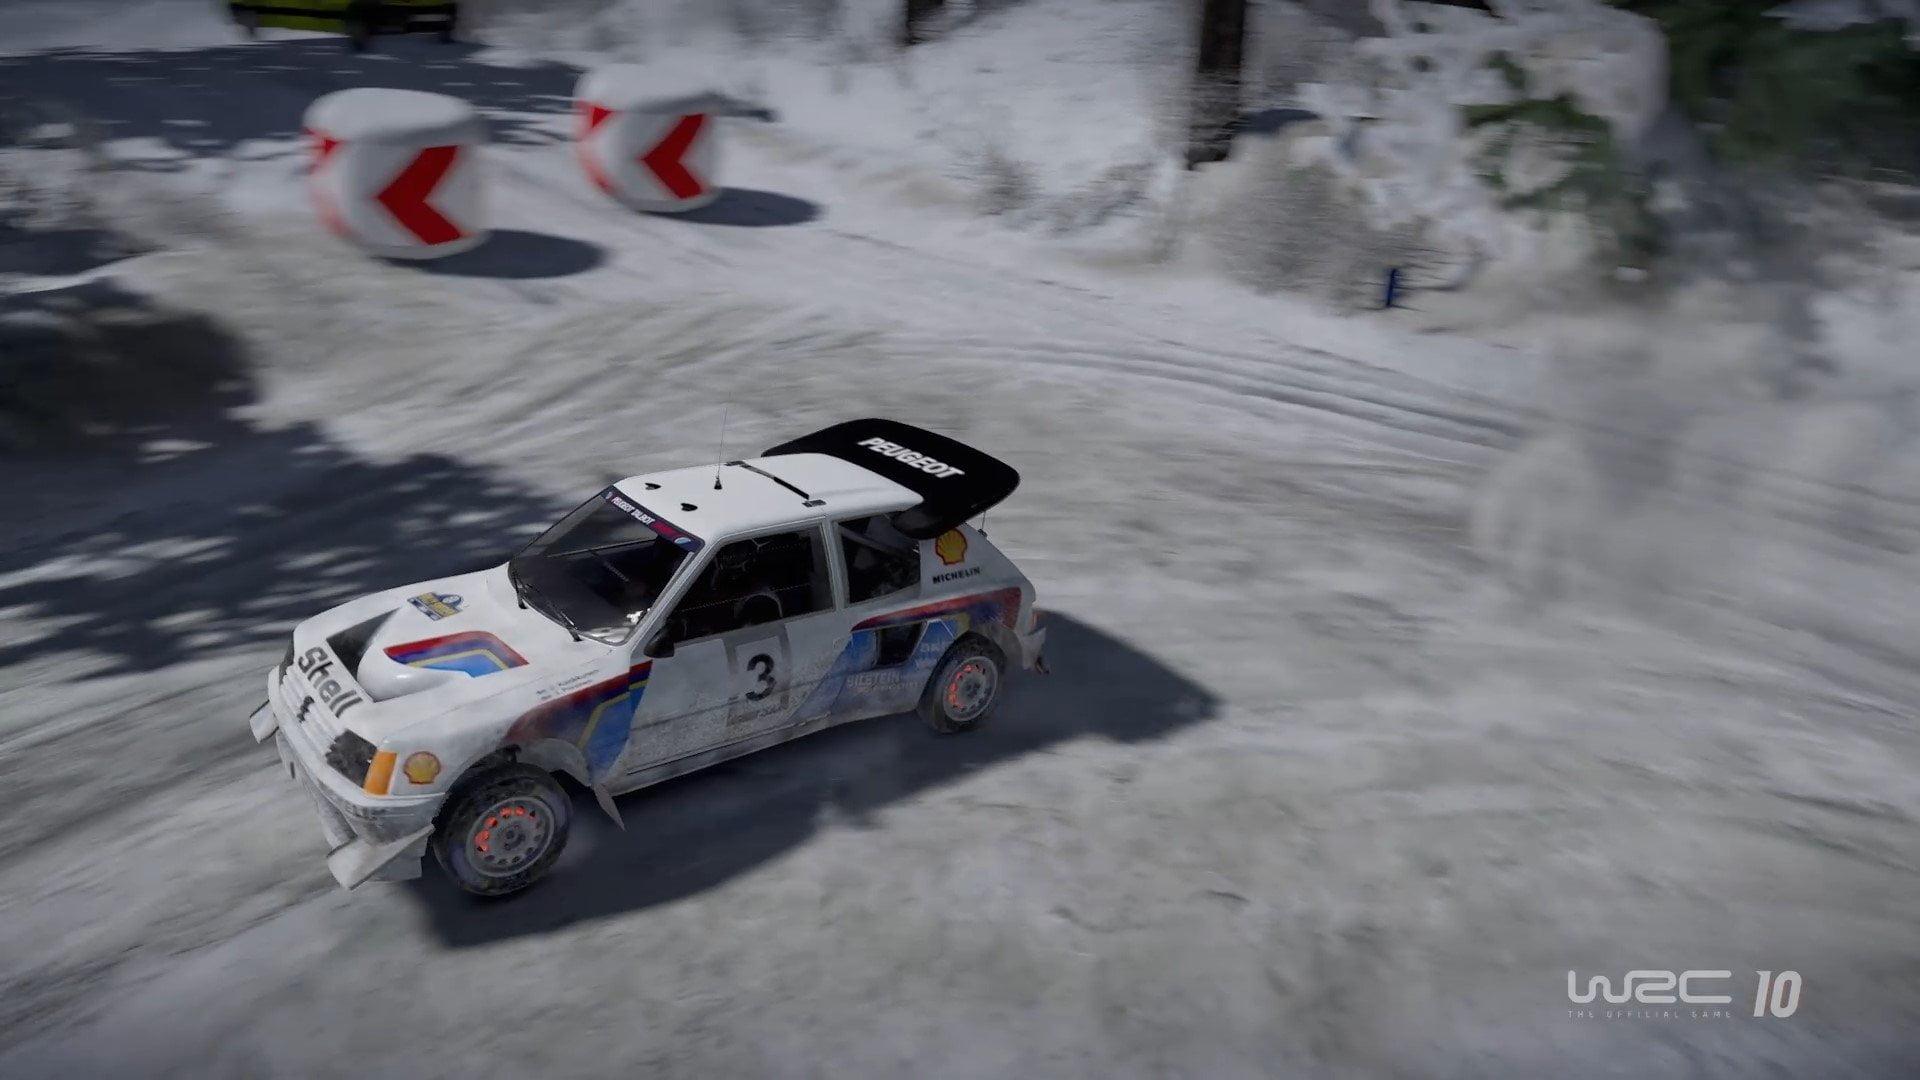 WRC-10-Gameplay-Suède-Peugeot-205-T16-11